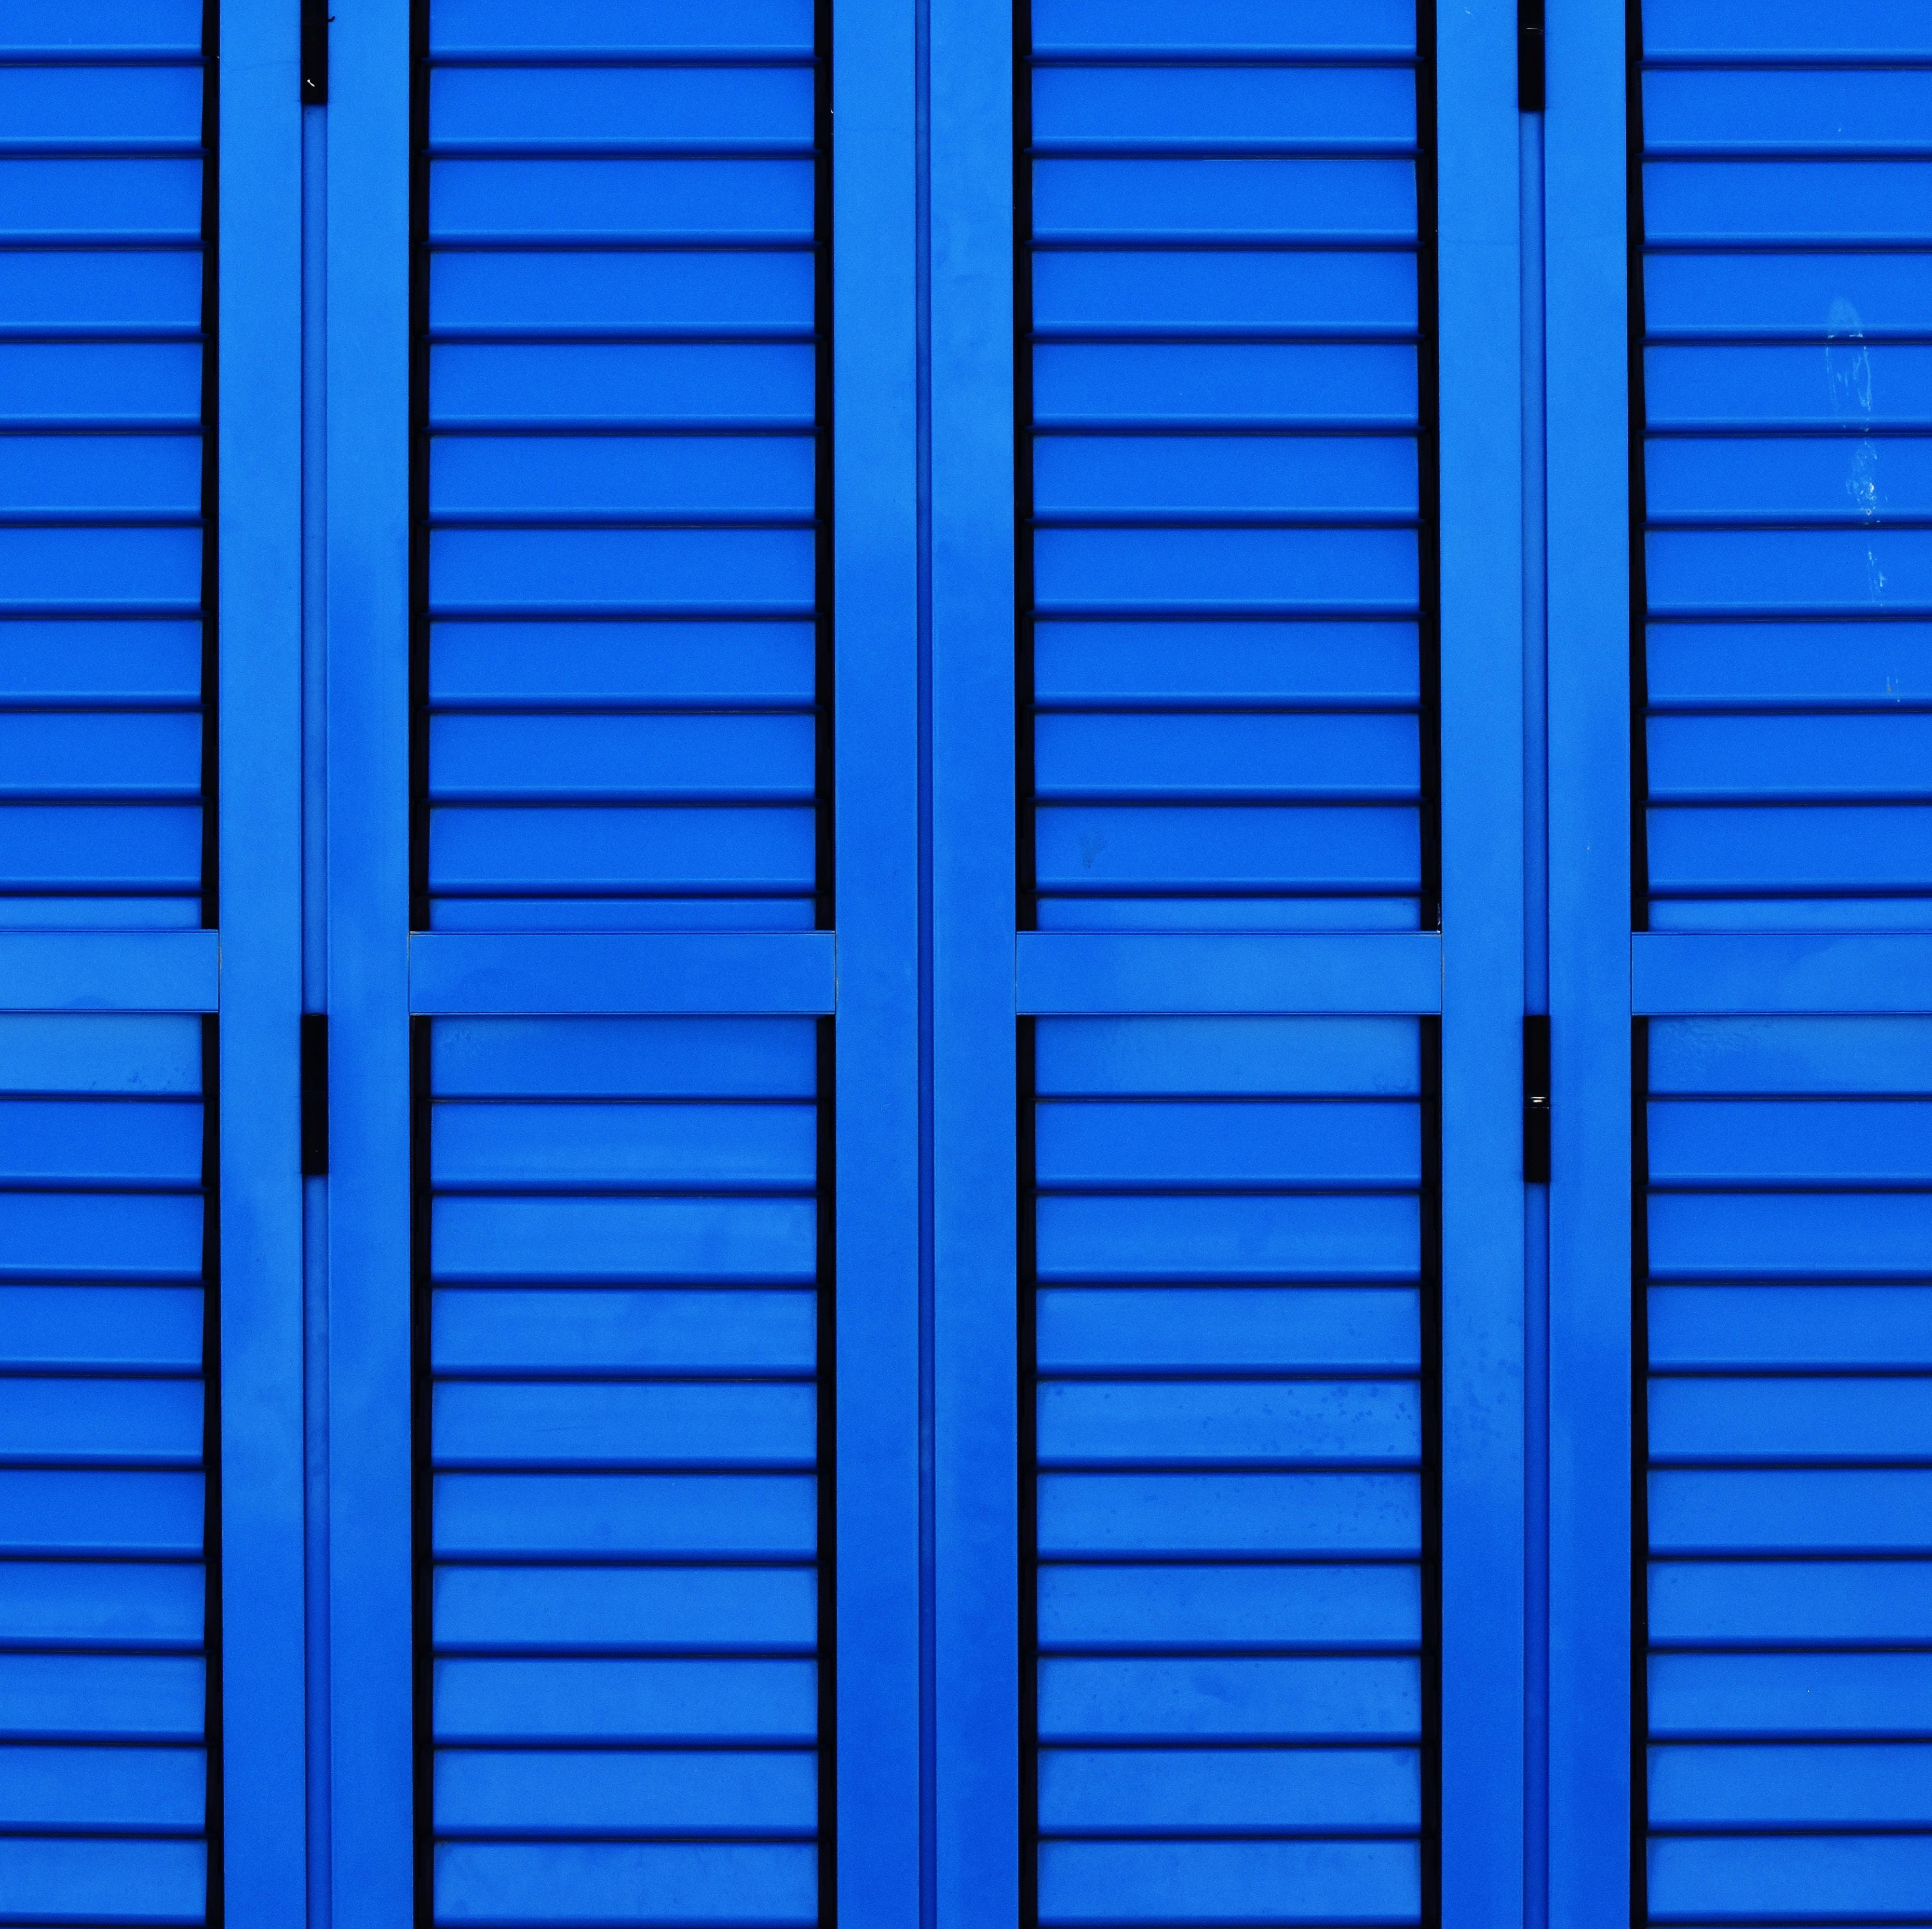 blue wooden cabinet